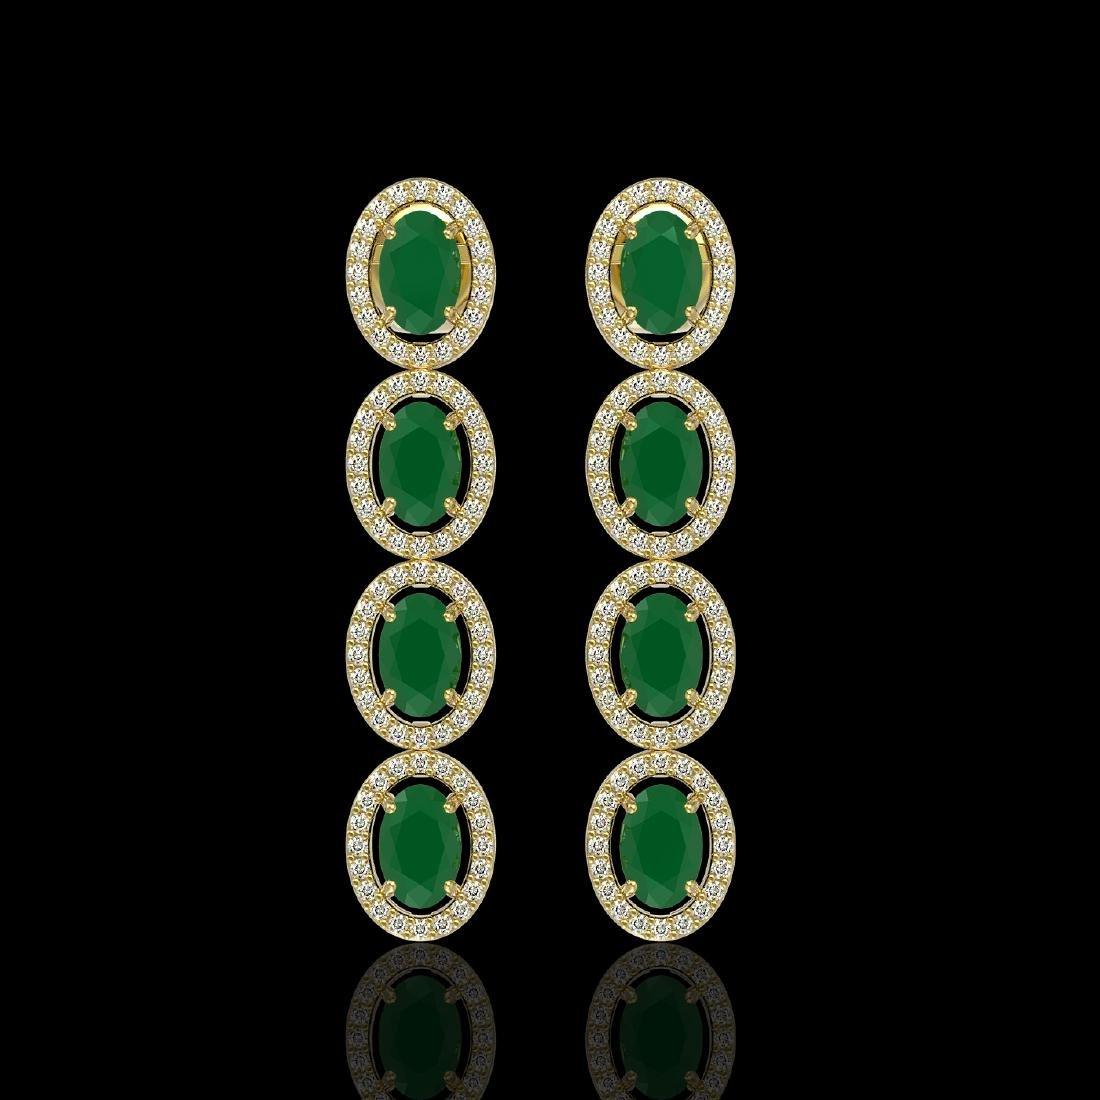 6.47 CTW Emerald & Diamond Halo Earrings 10K Yellow